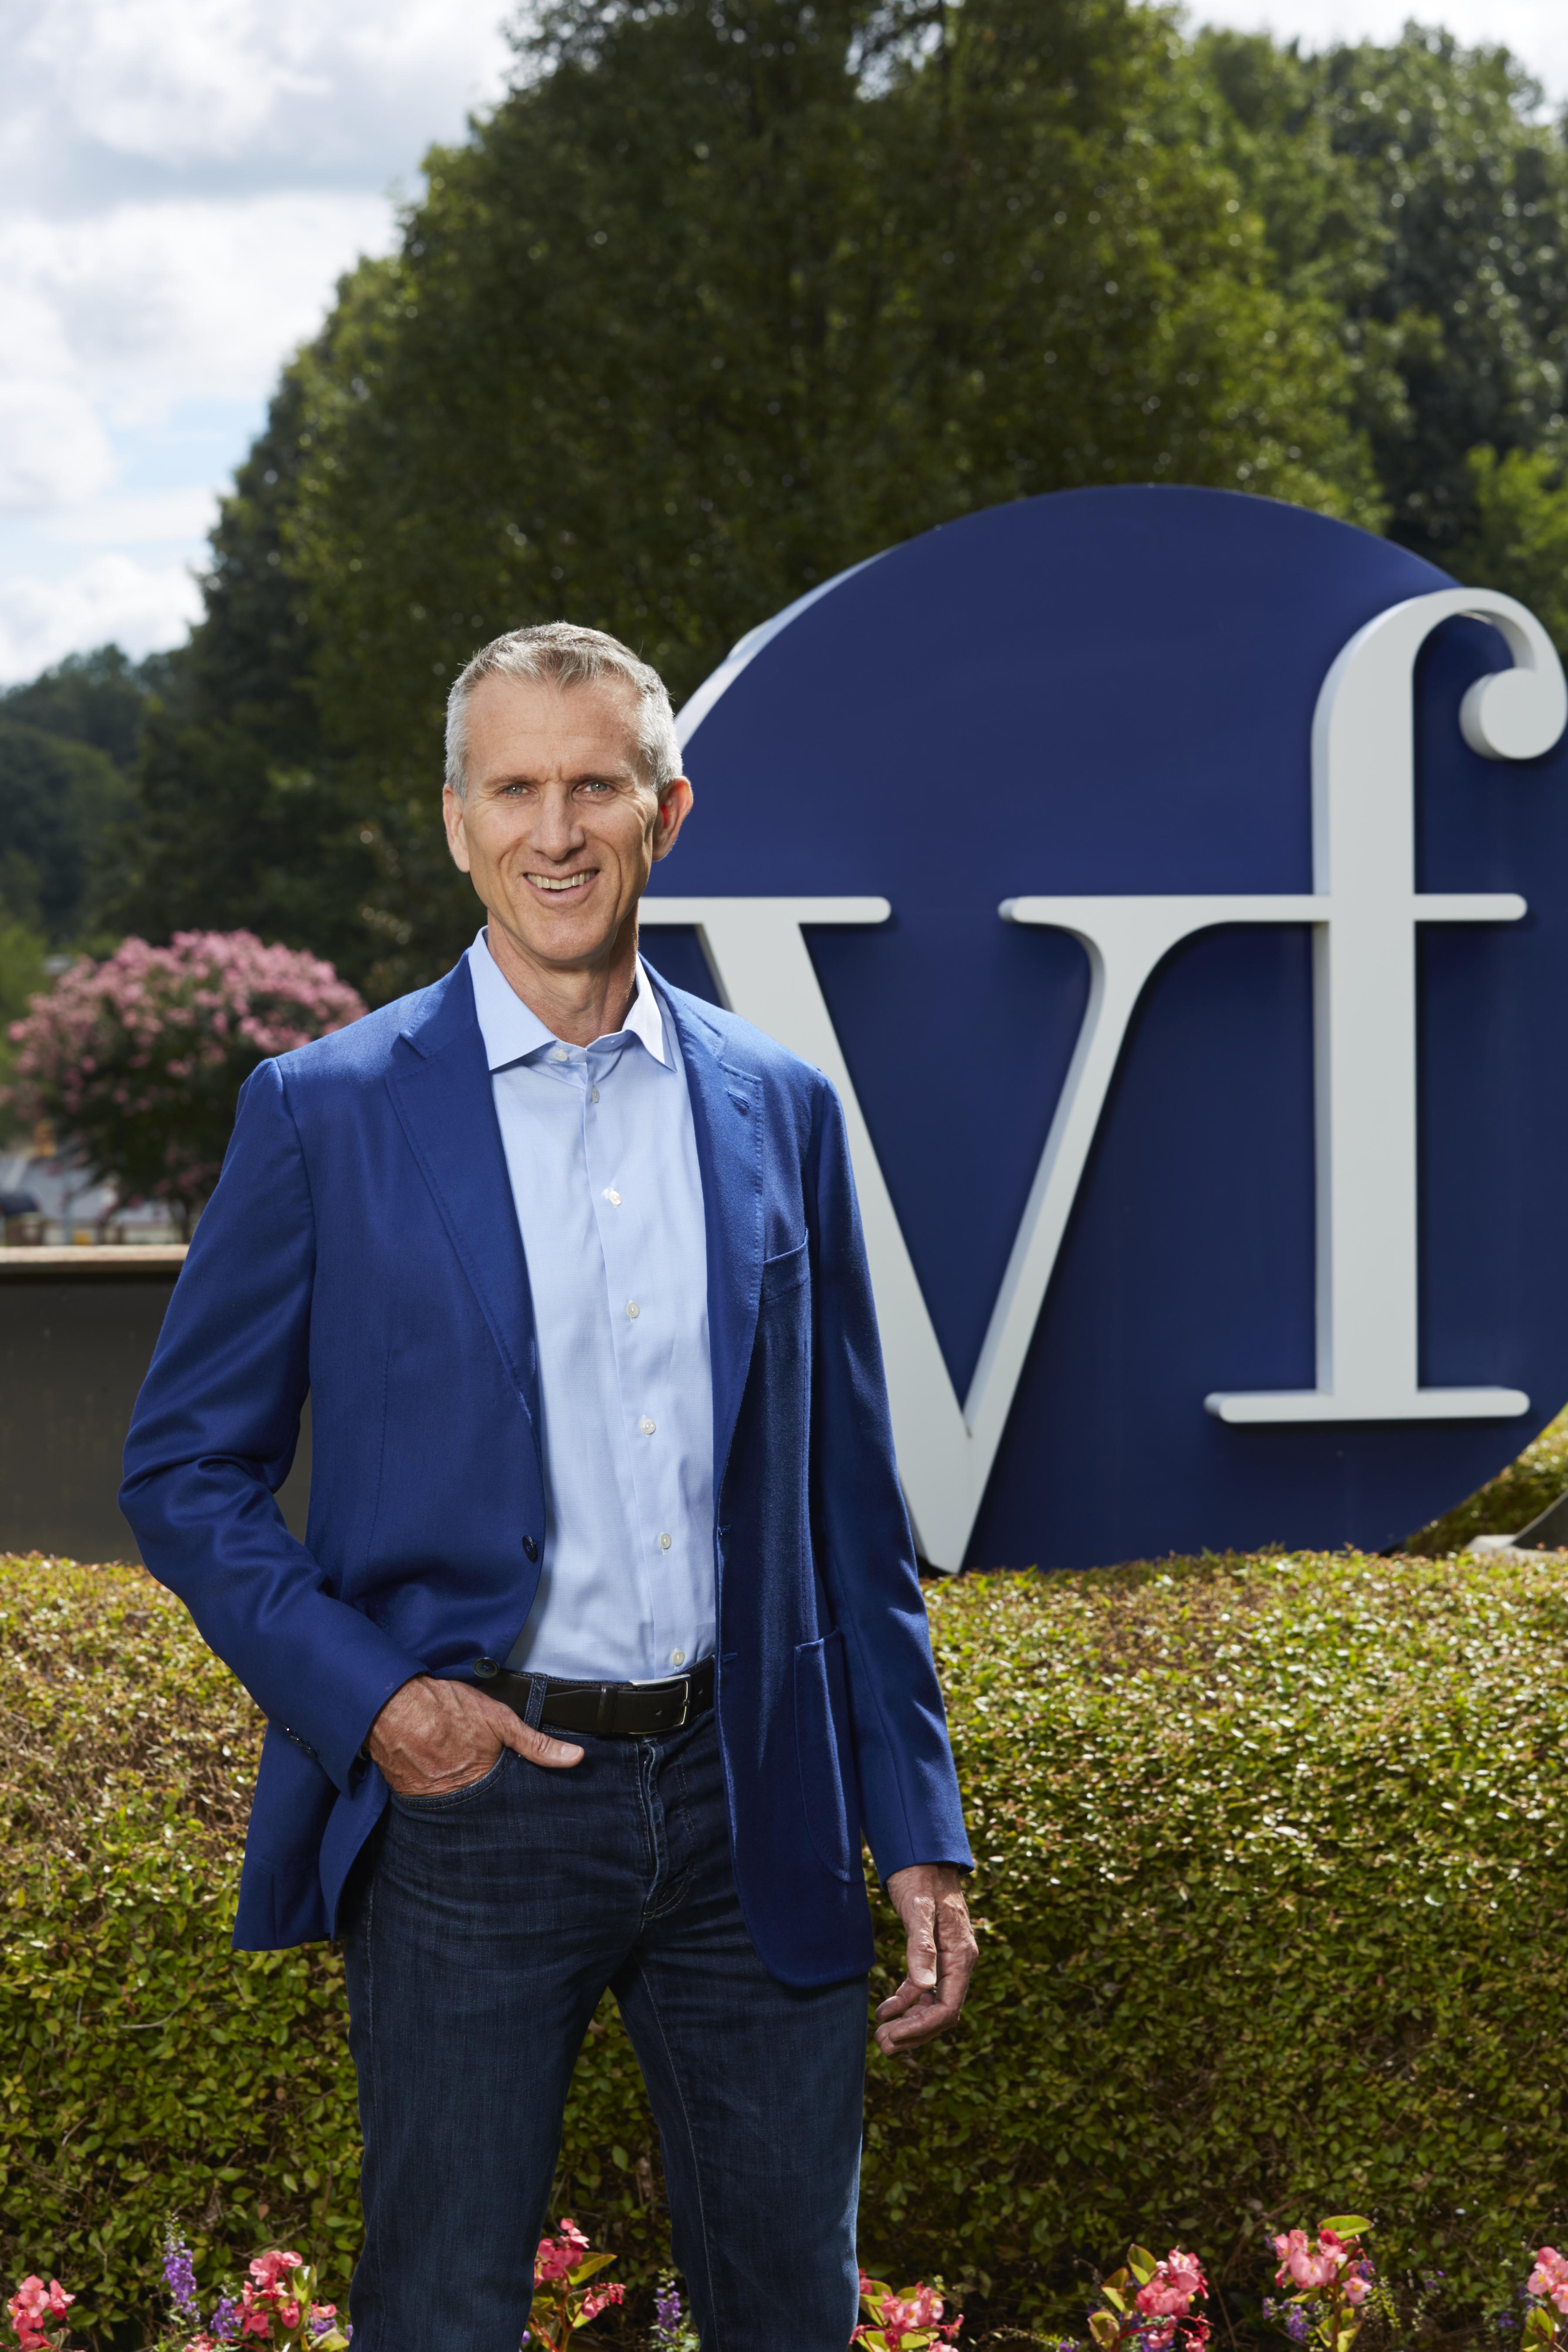 Steve Rendle, VF Corp. north face vans